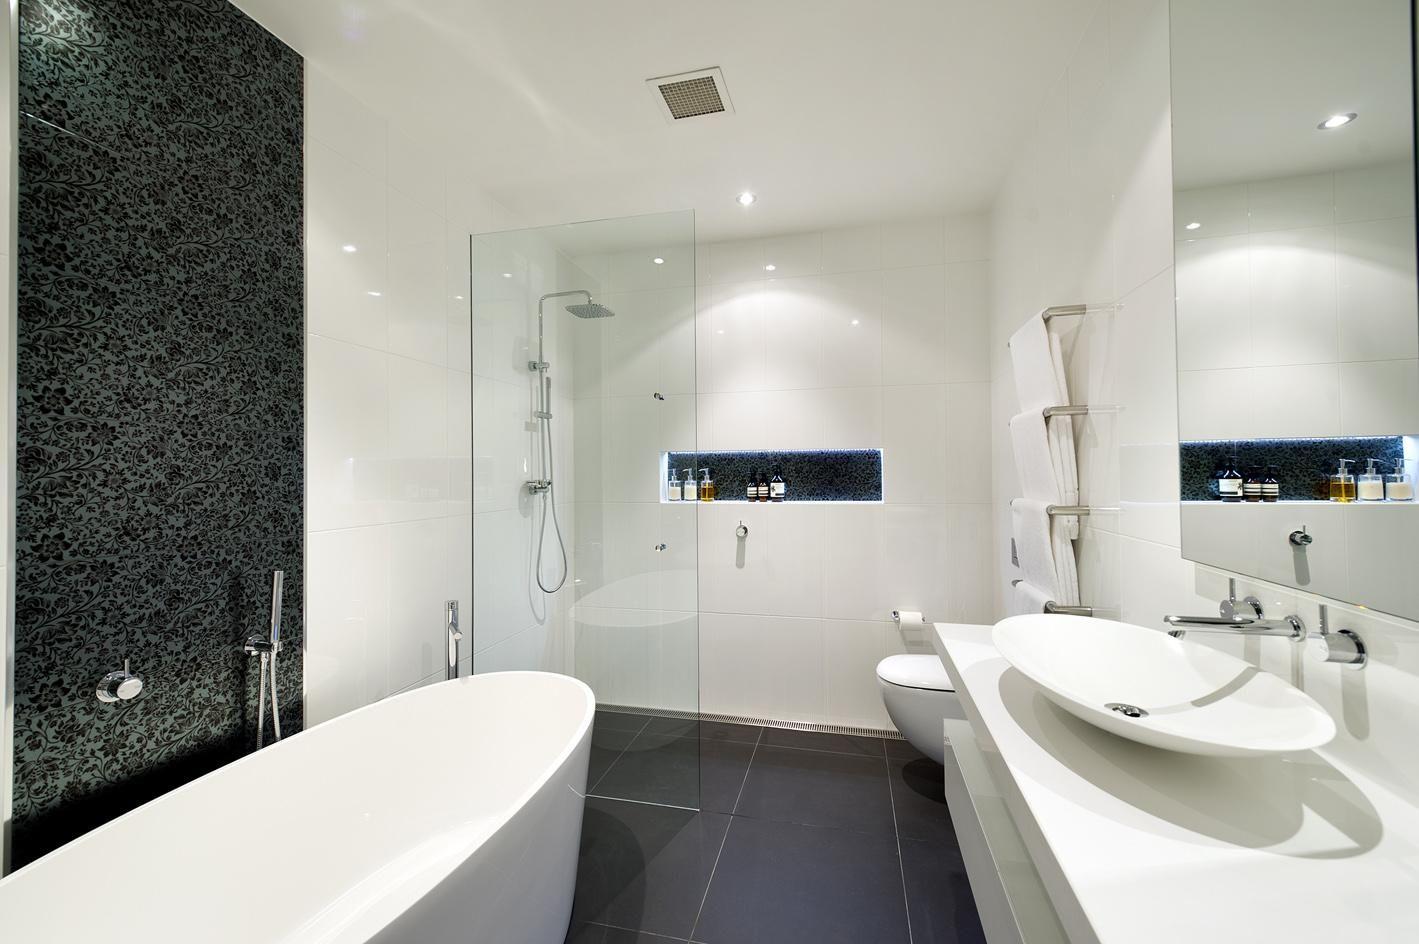 DESIGNER BATHROOMS IDEA FOR A PERFECT BATHROOM Check more at http ...